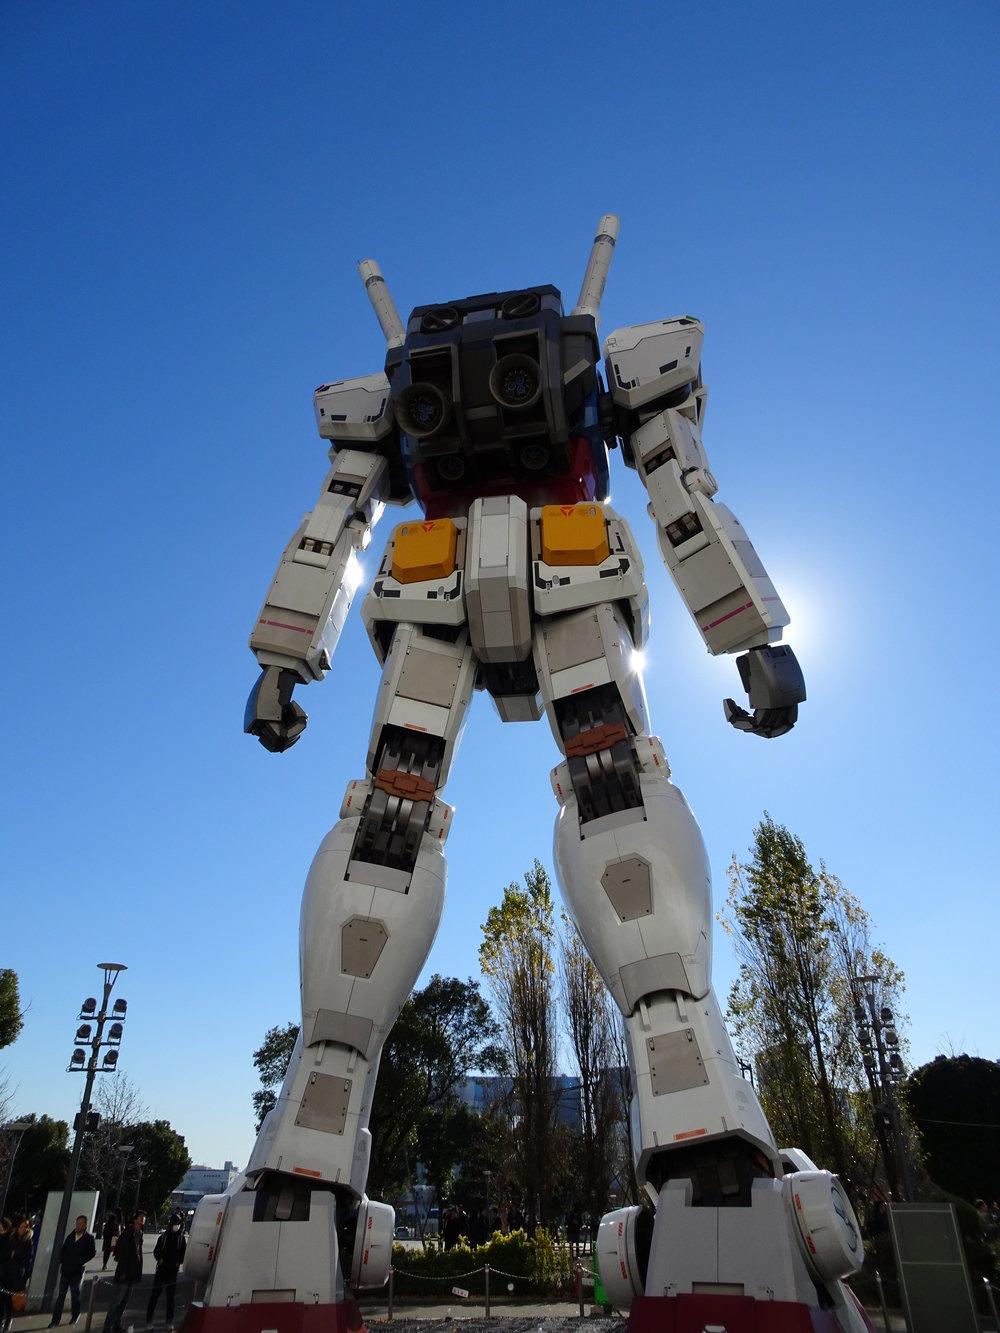 RX-78-2 Gundam 1-1 Statue - 044.jpg